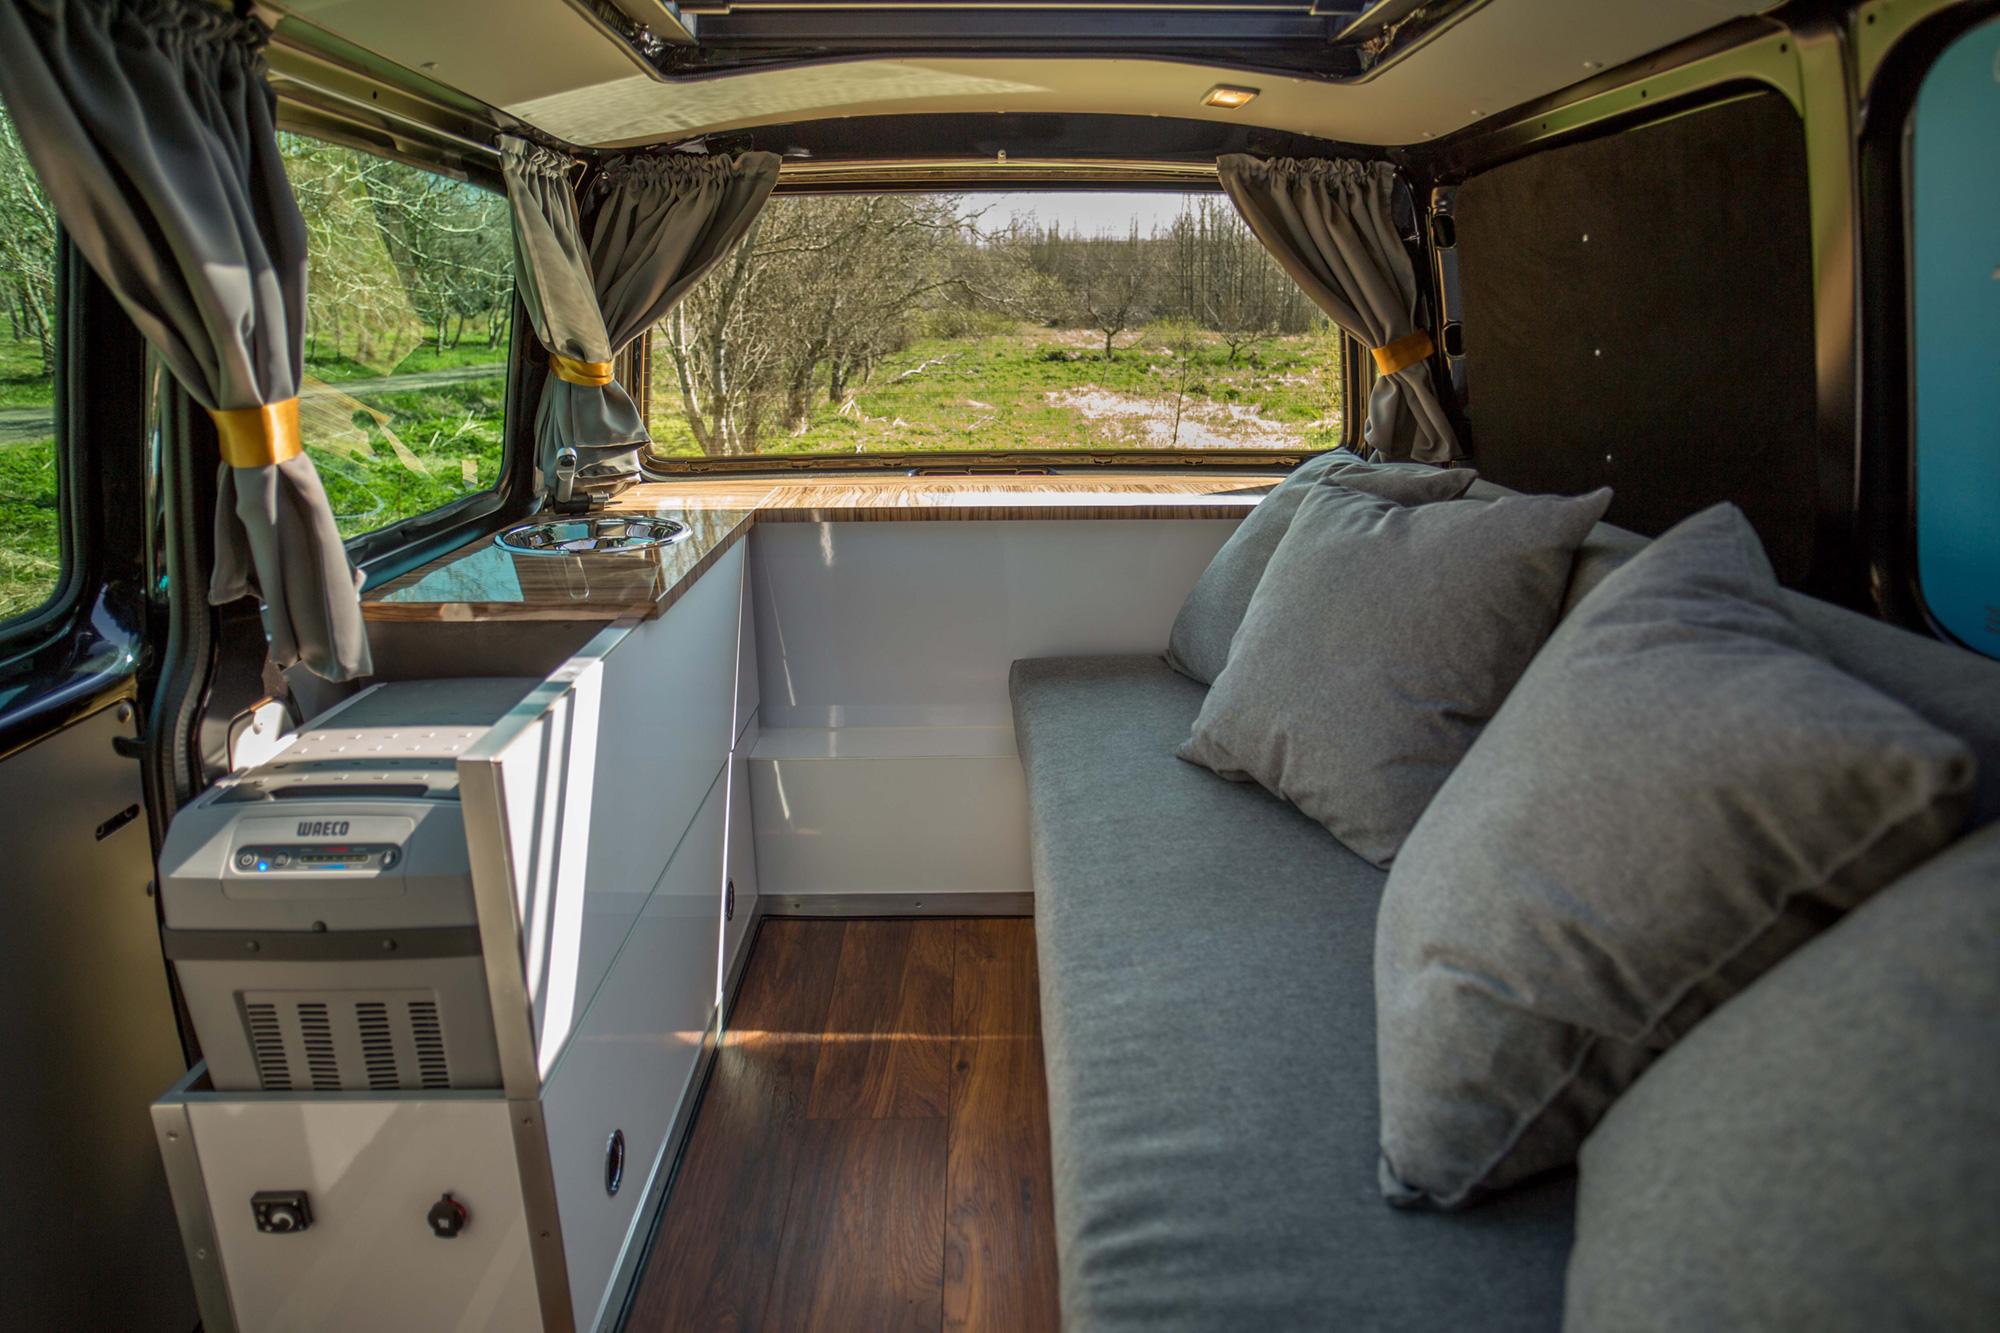 4x4 Camper Rental Iceland Rent A Cozy 3 Camper